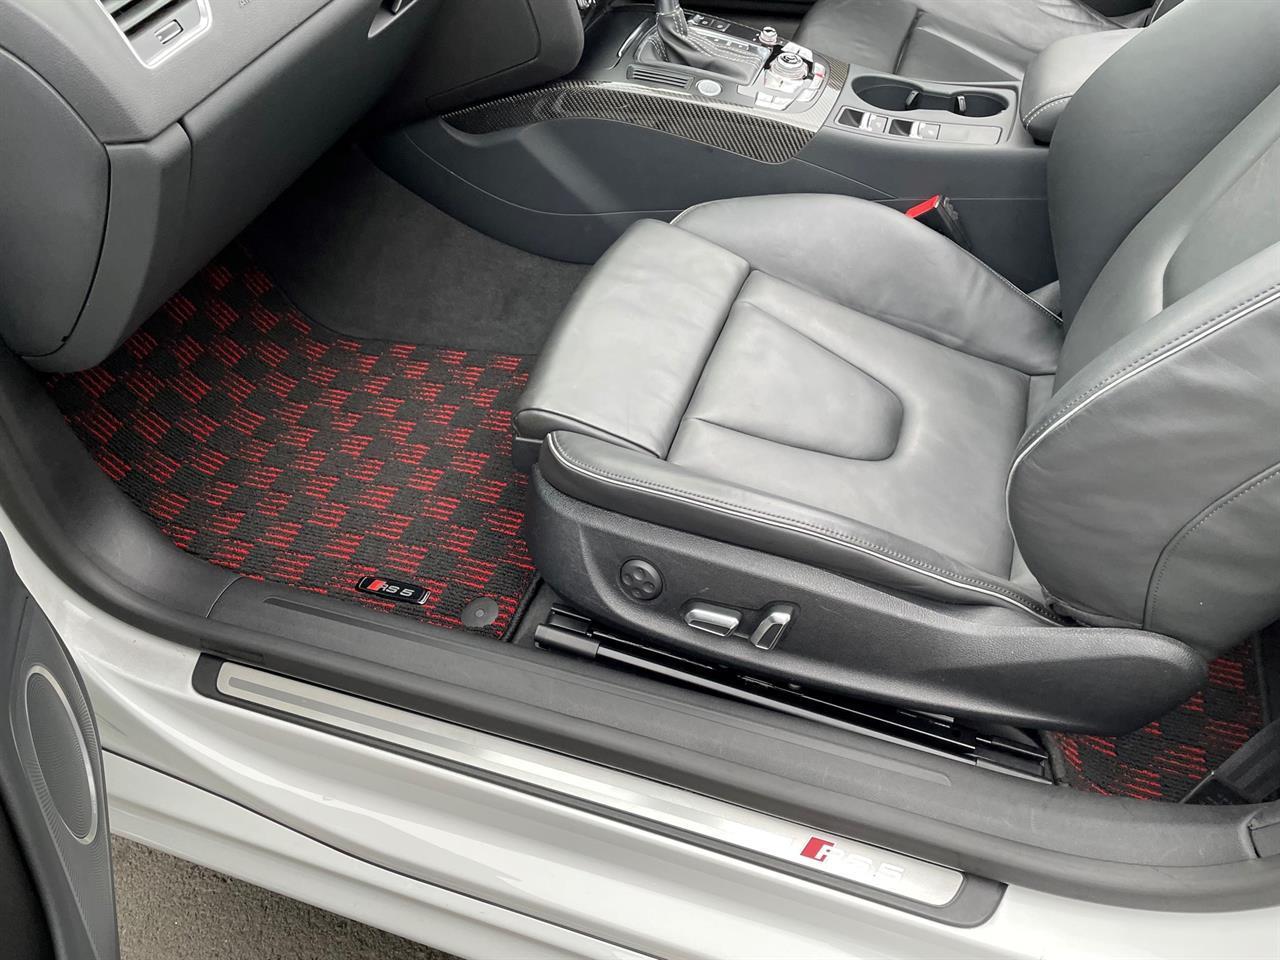 image-8, 2013 Audi RS5 4.2 V8 FSI Facelift Convertible at Christchurch